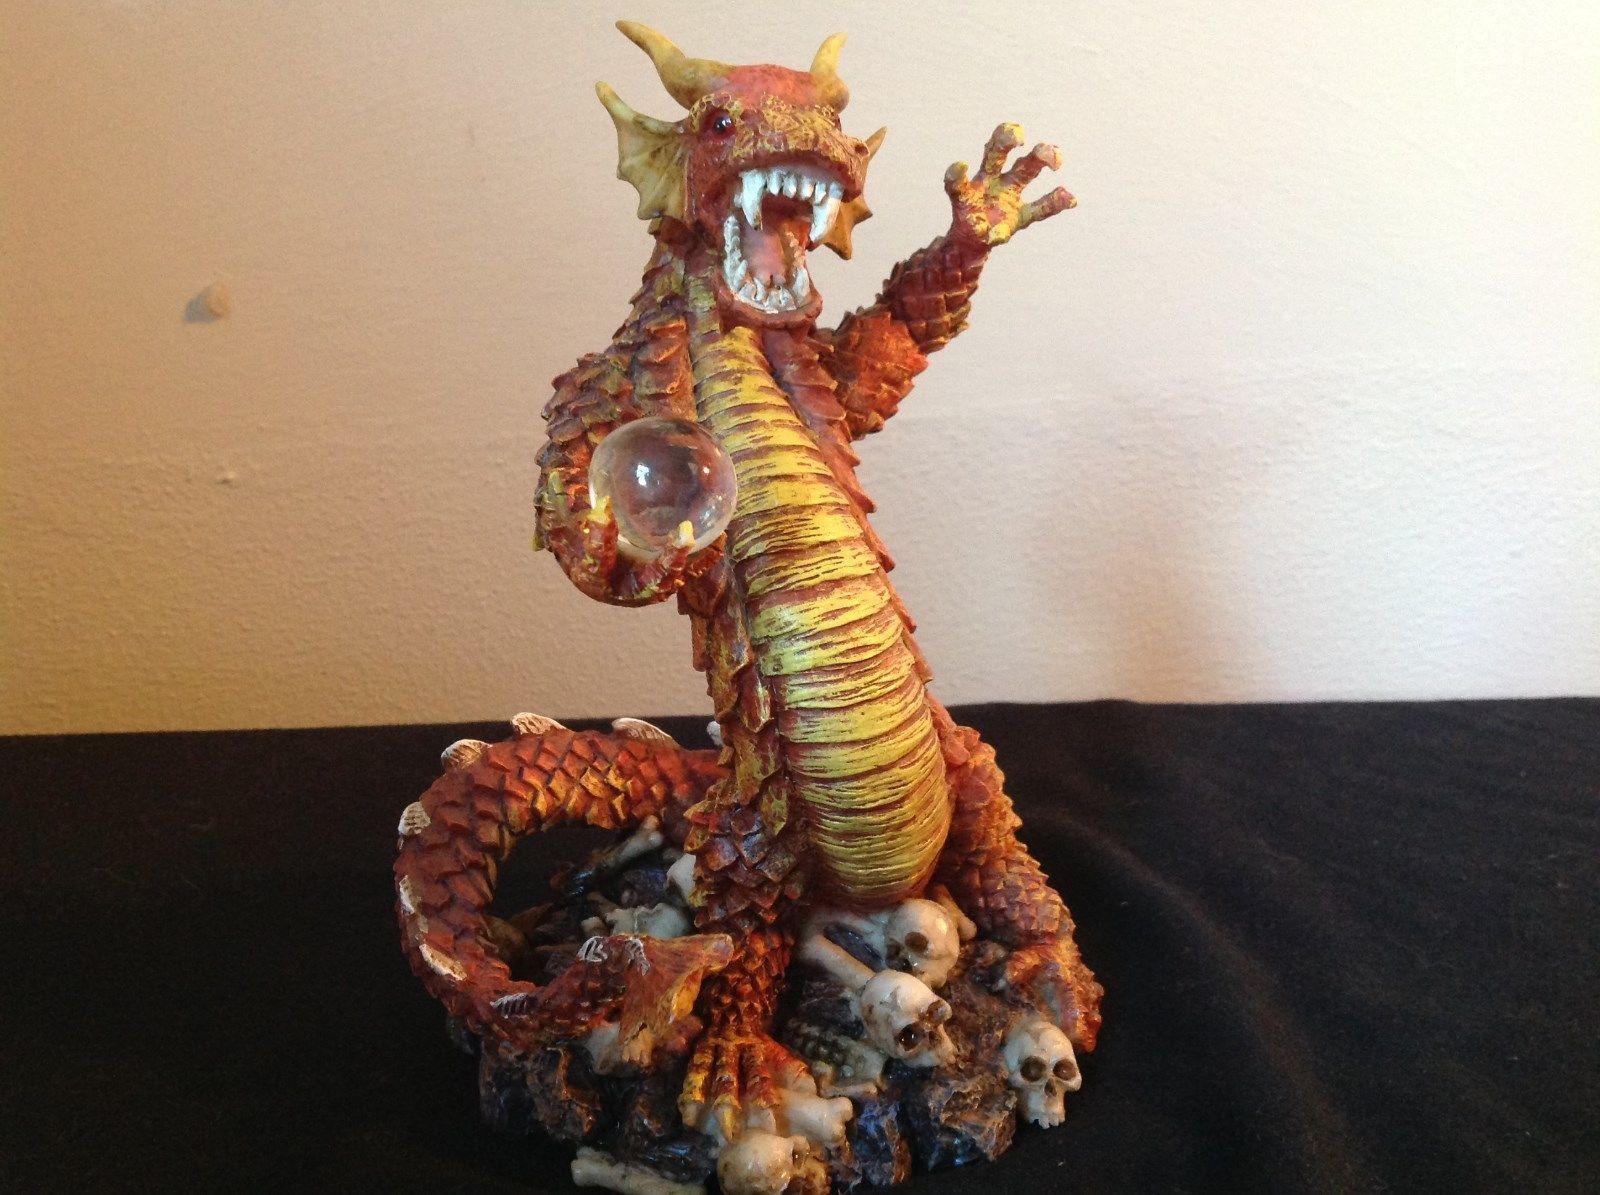 Big Red Dragon Statue Guarding Crystal Ball Skulls and Bones